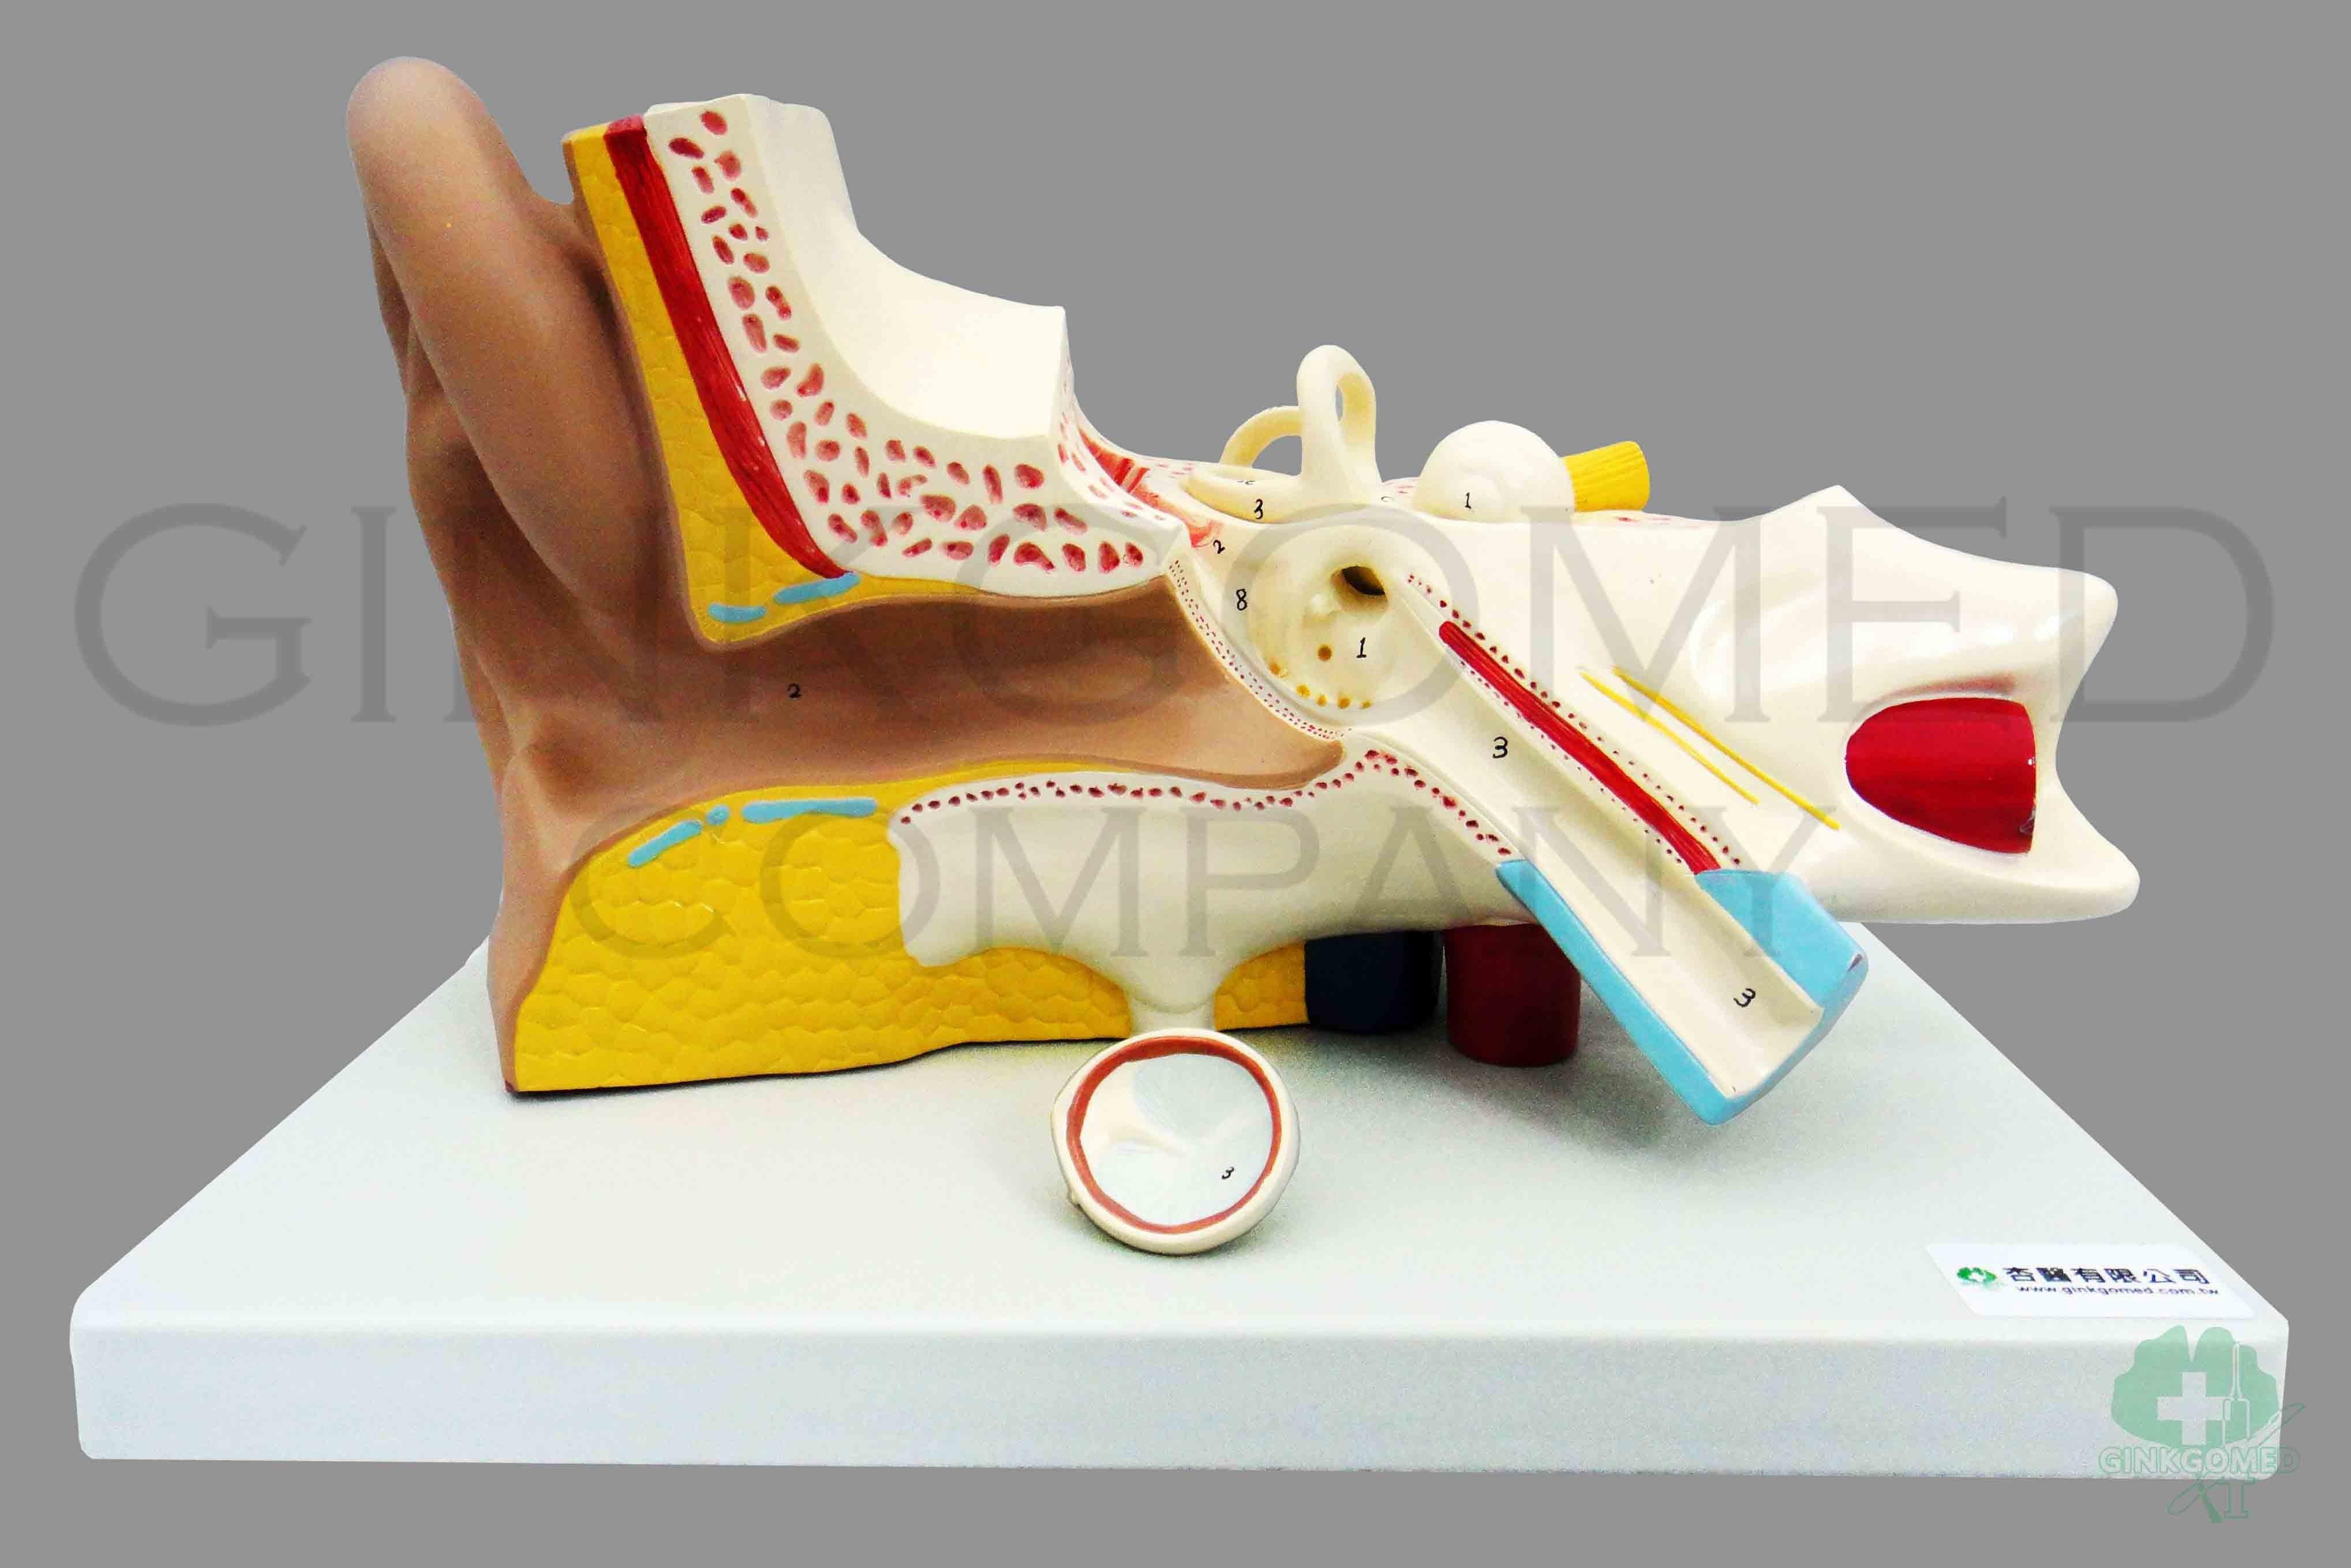 GM-080007 Ear Anatomy - Head, Neck, Nervous System and Sense Organs ...